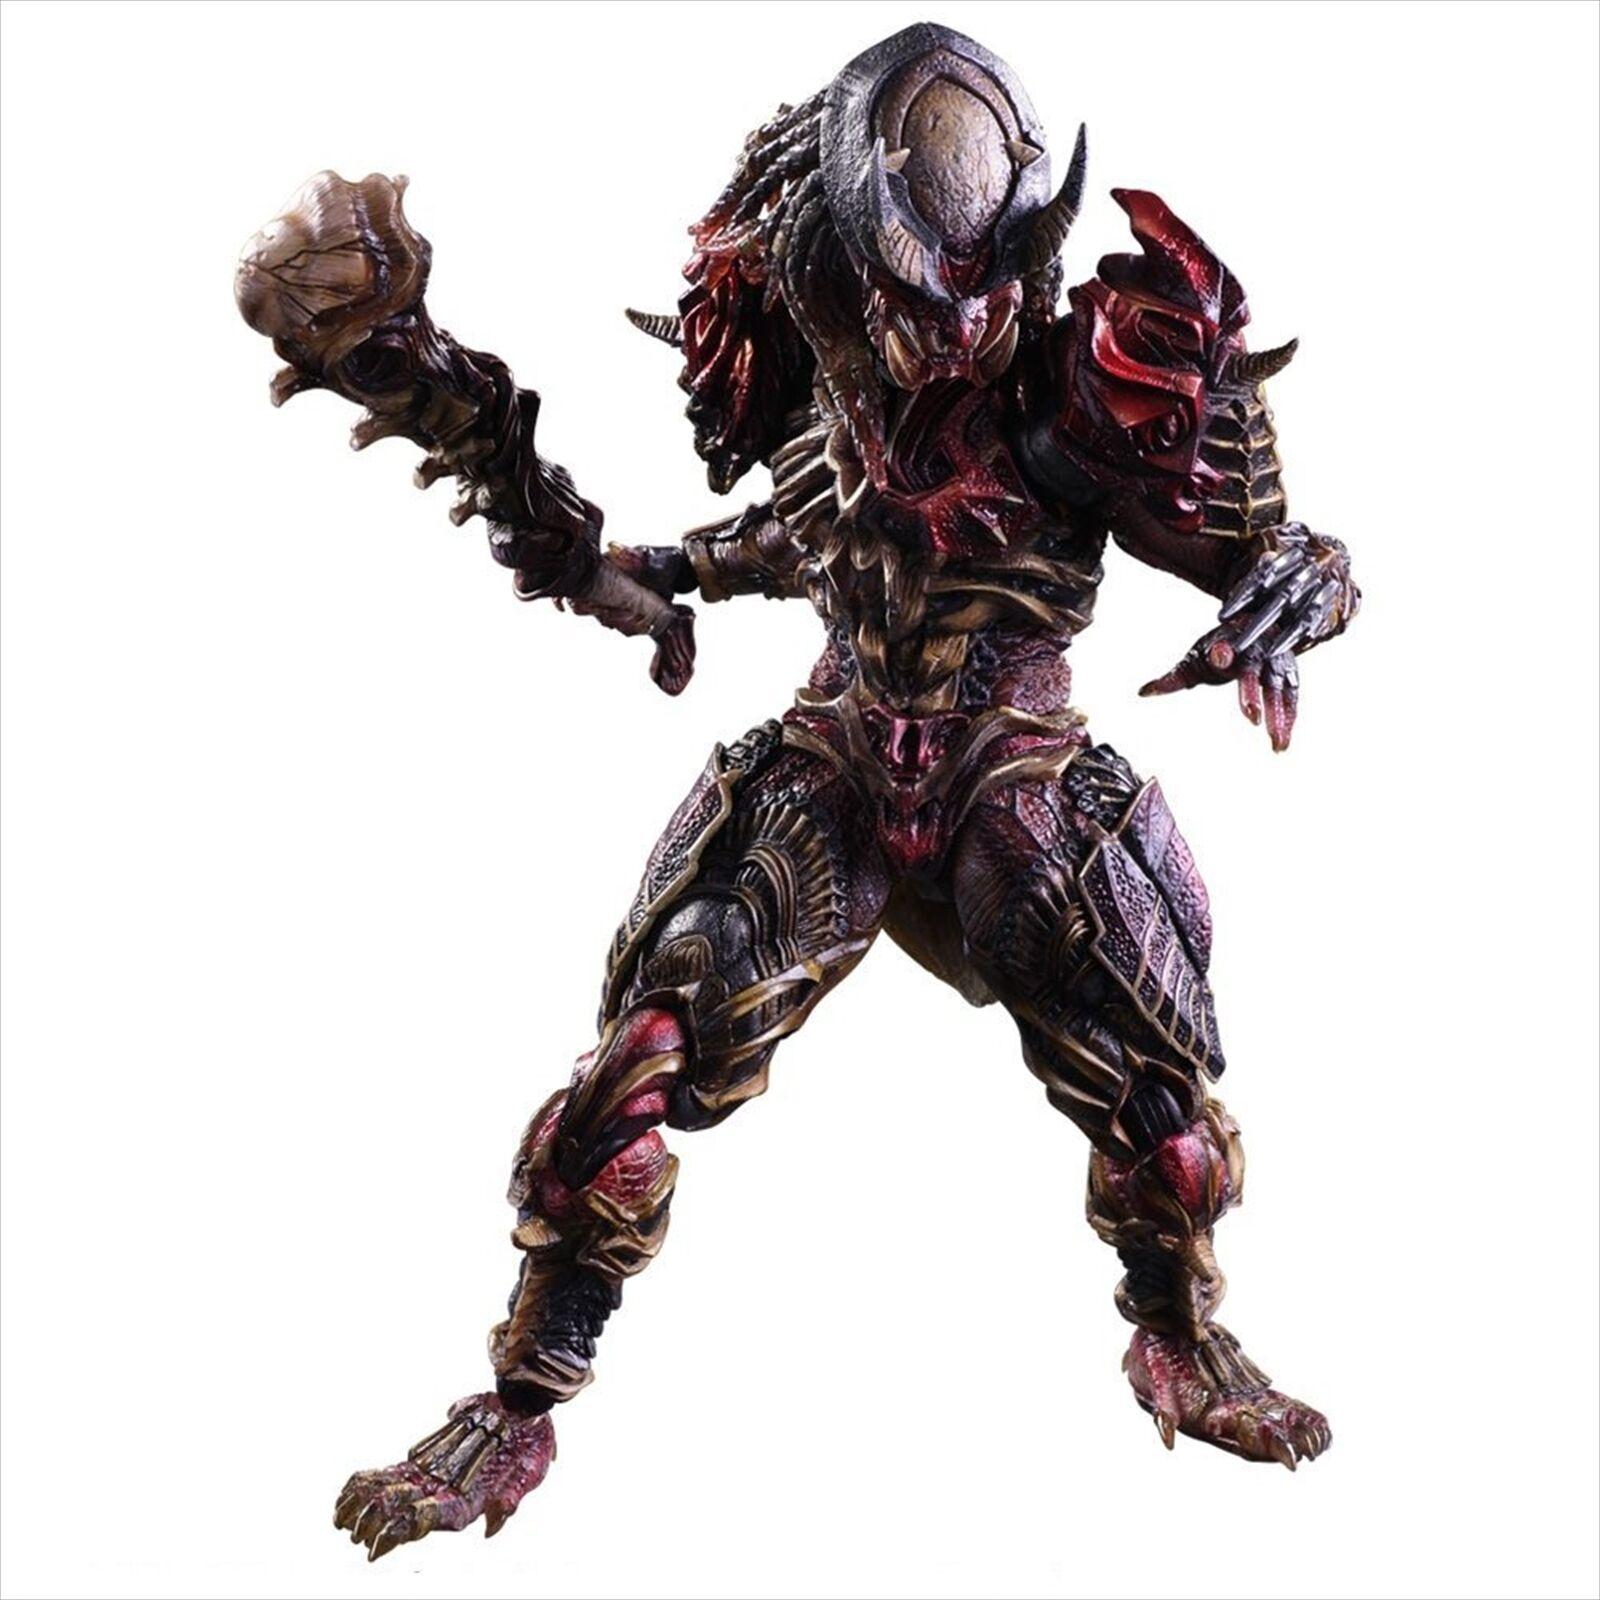 Square Enix Variant Play Arts Kai PROTator Action Figure Figure Figure 9400e3